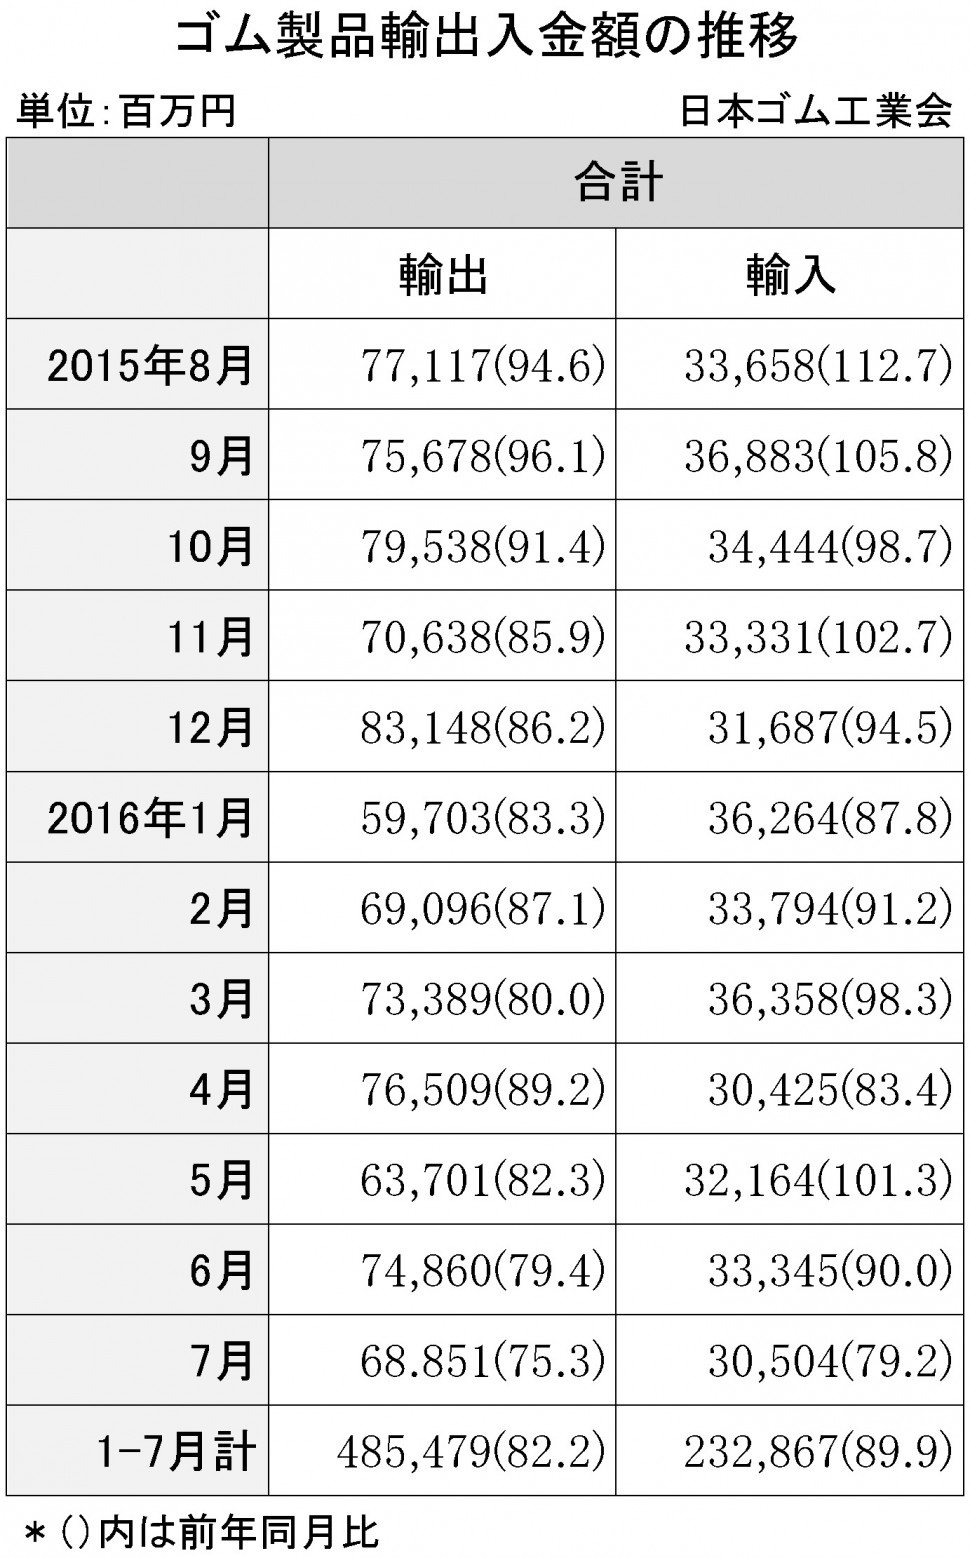 2016年7月ゴム製品輸出入金額